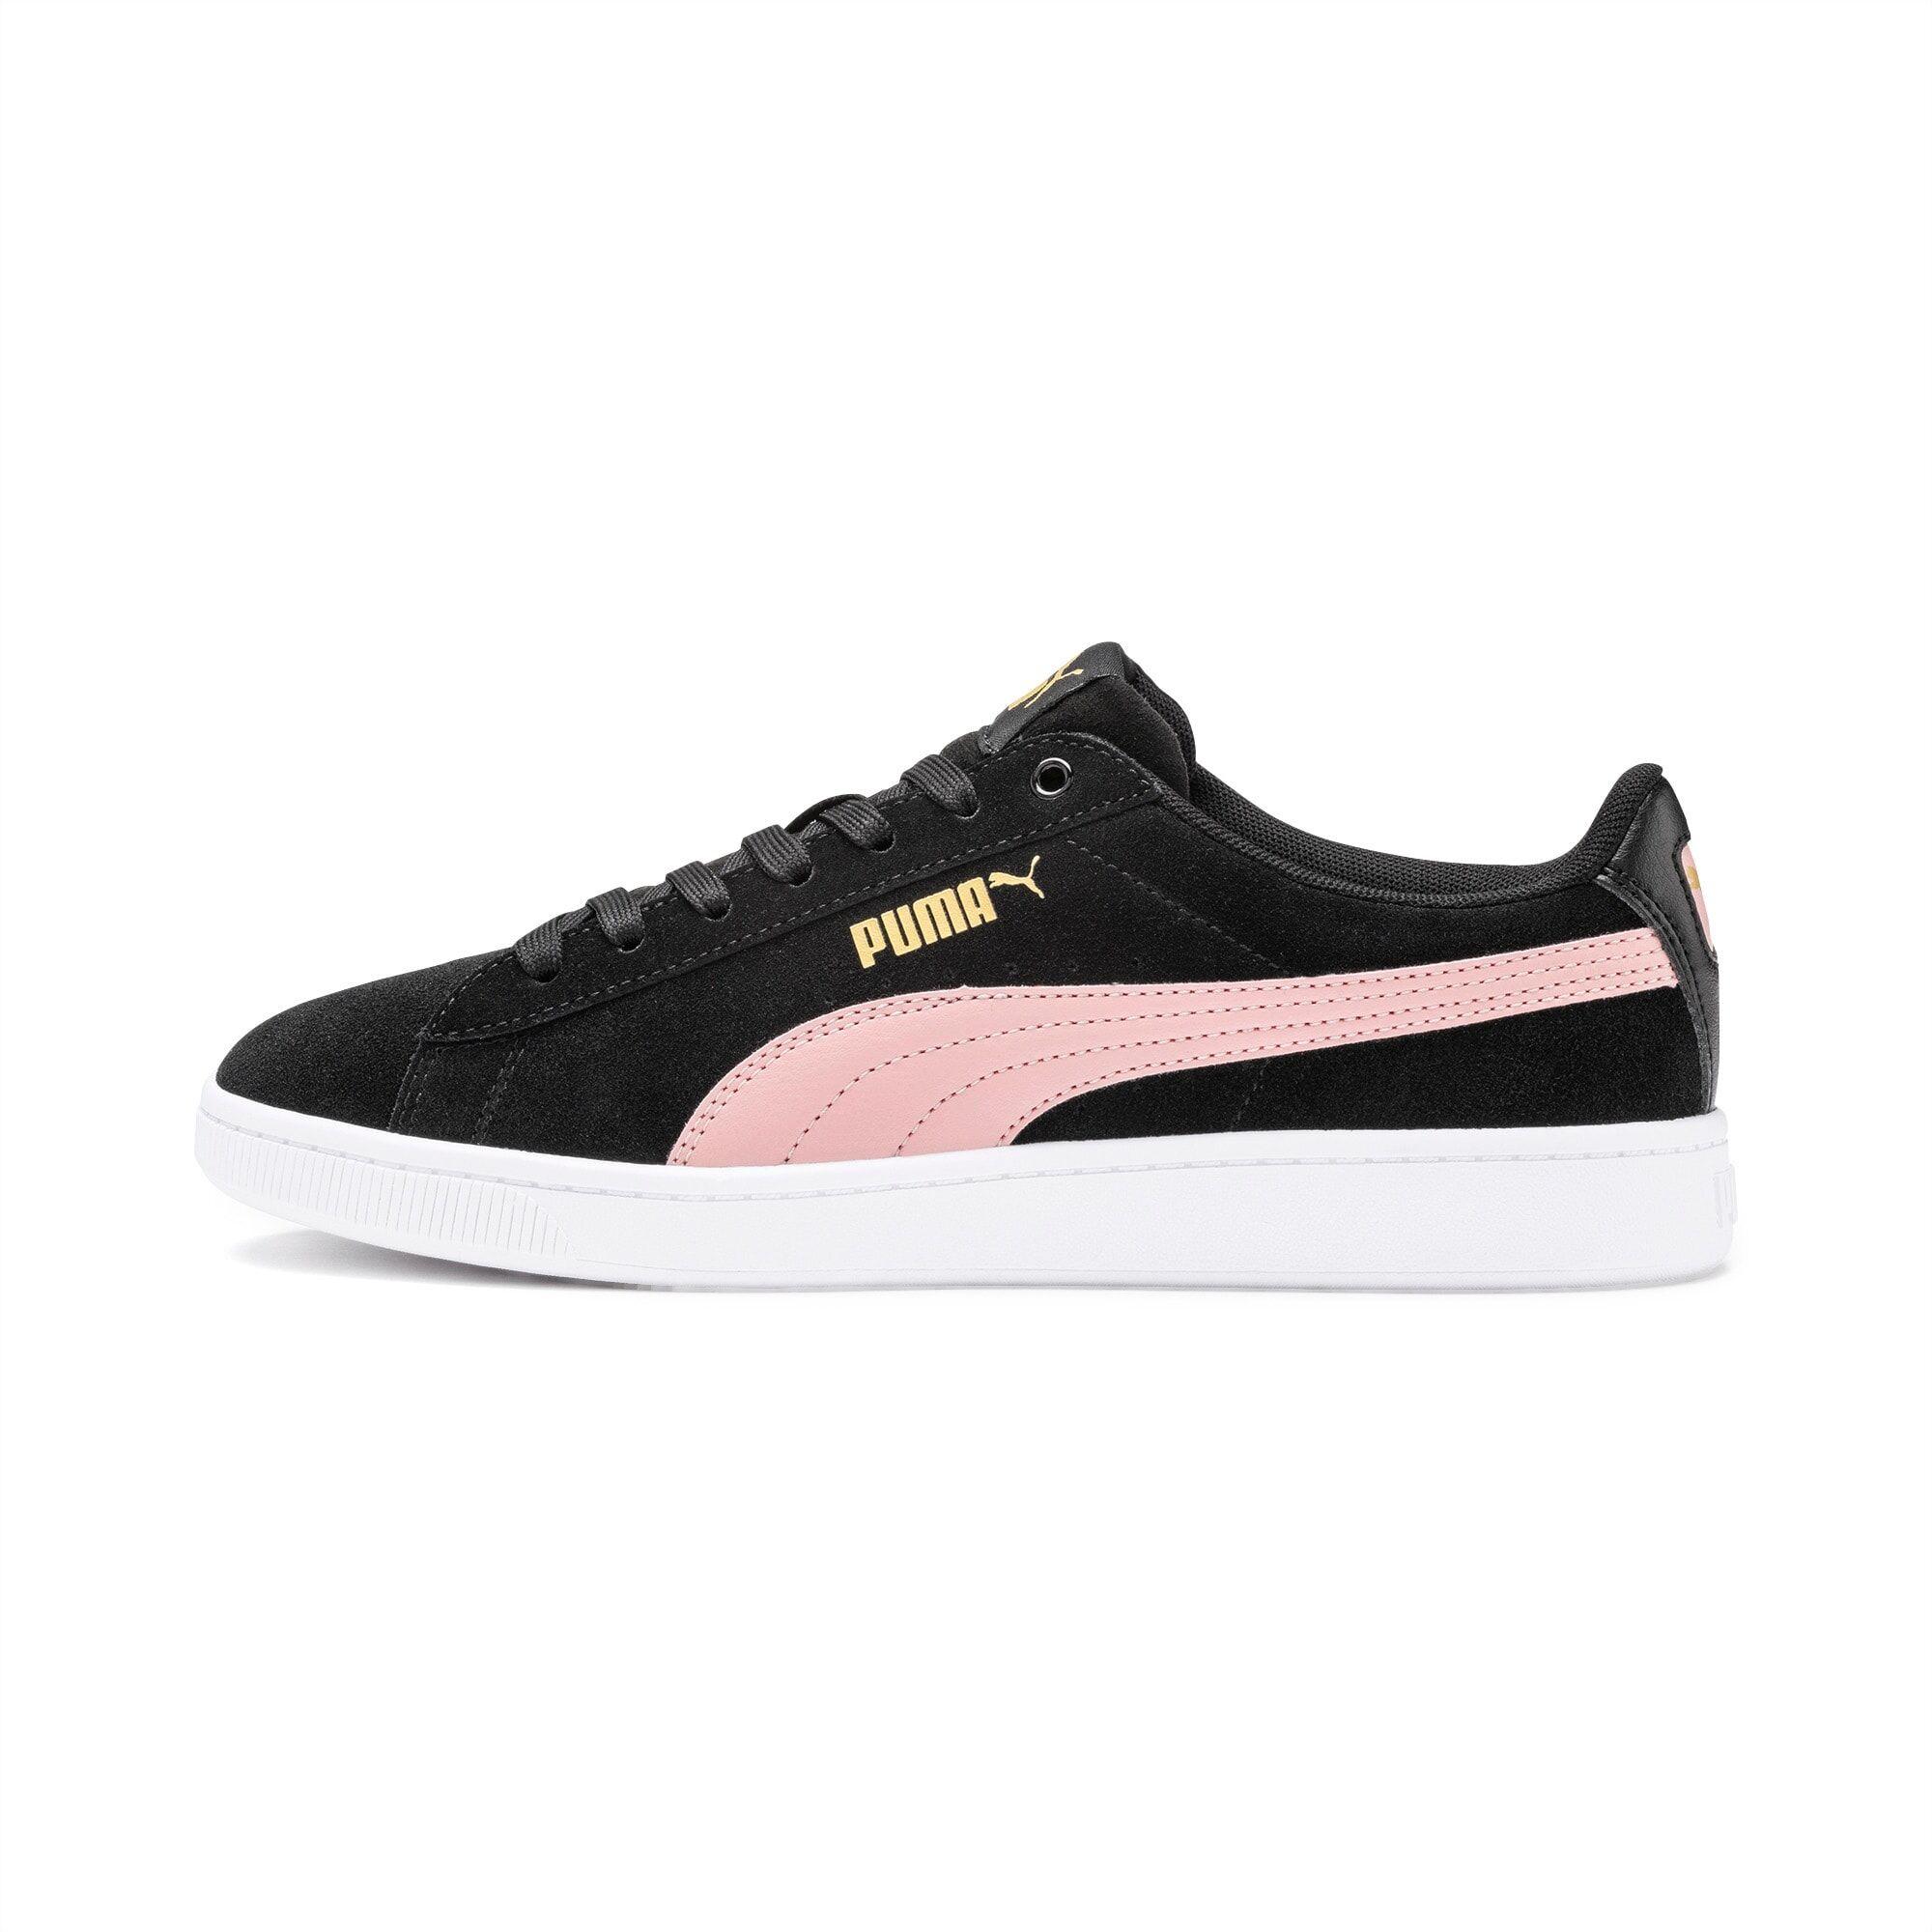 PUMA Chaussure Basket Vikky v2 pour Femme, Blanc/Rose/Noir, Taille 35.5, Chaussures